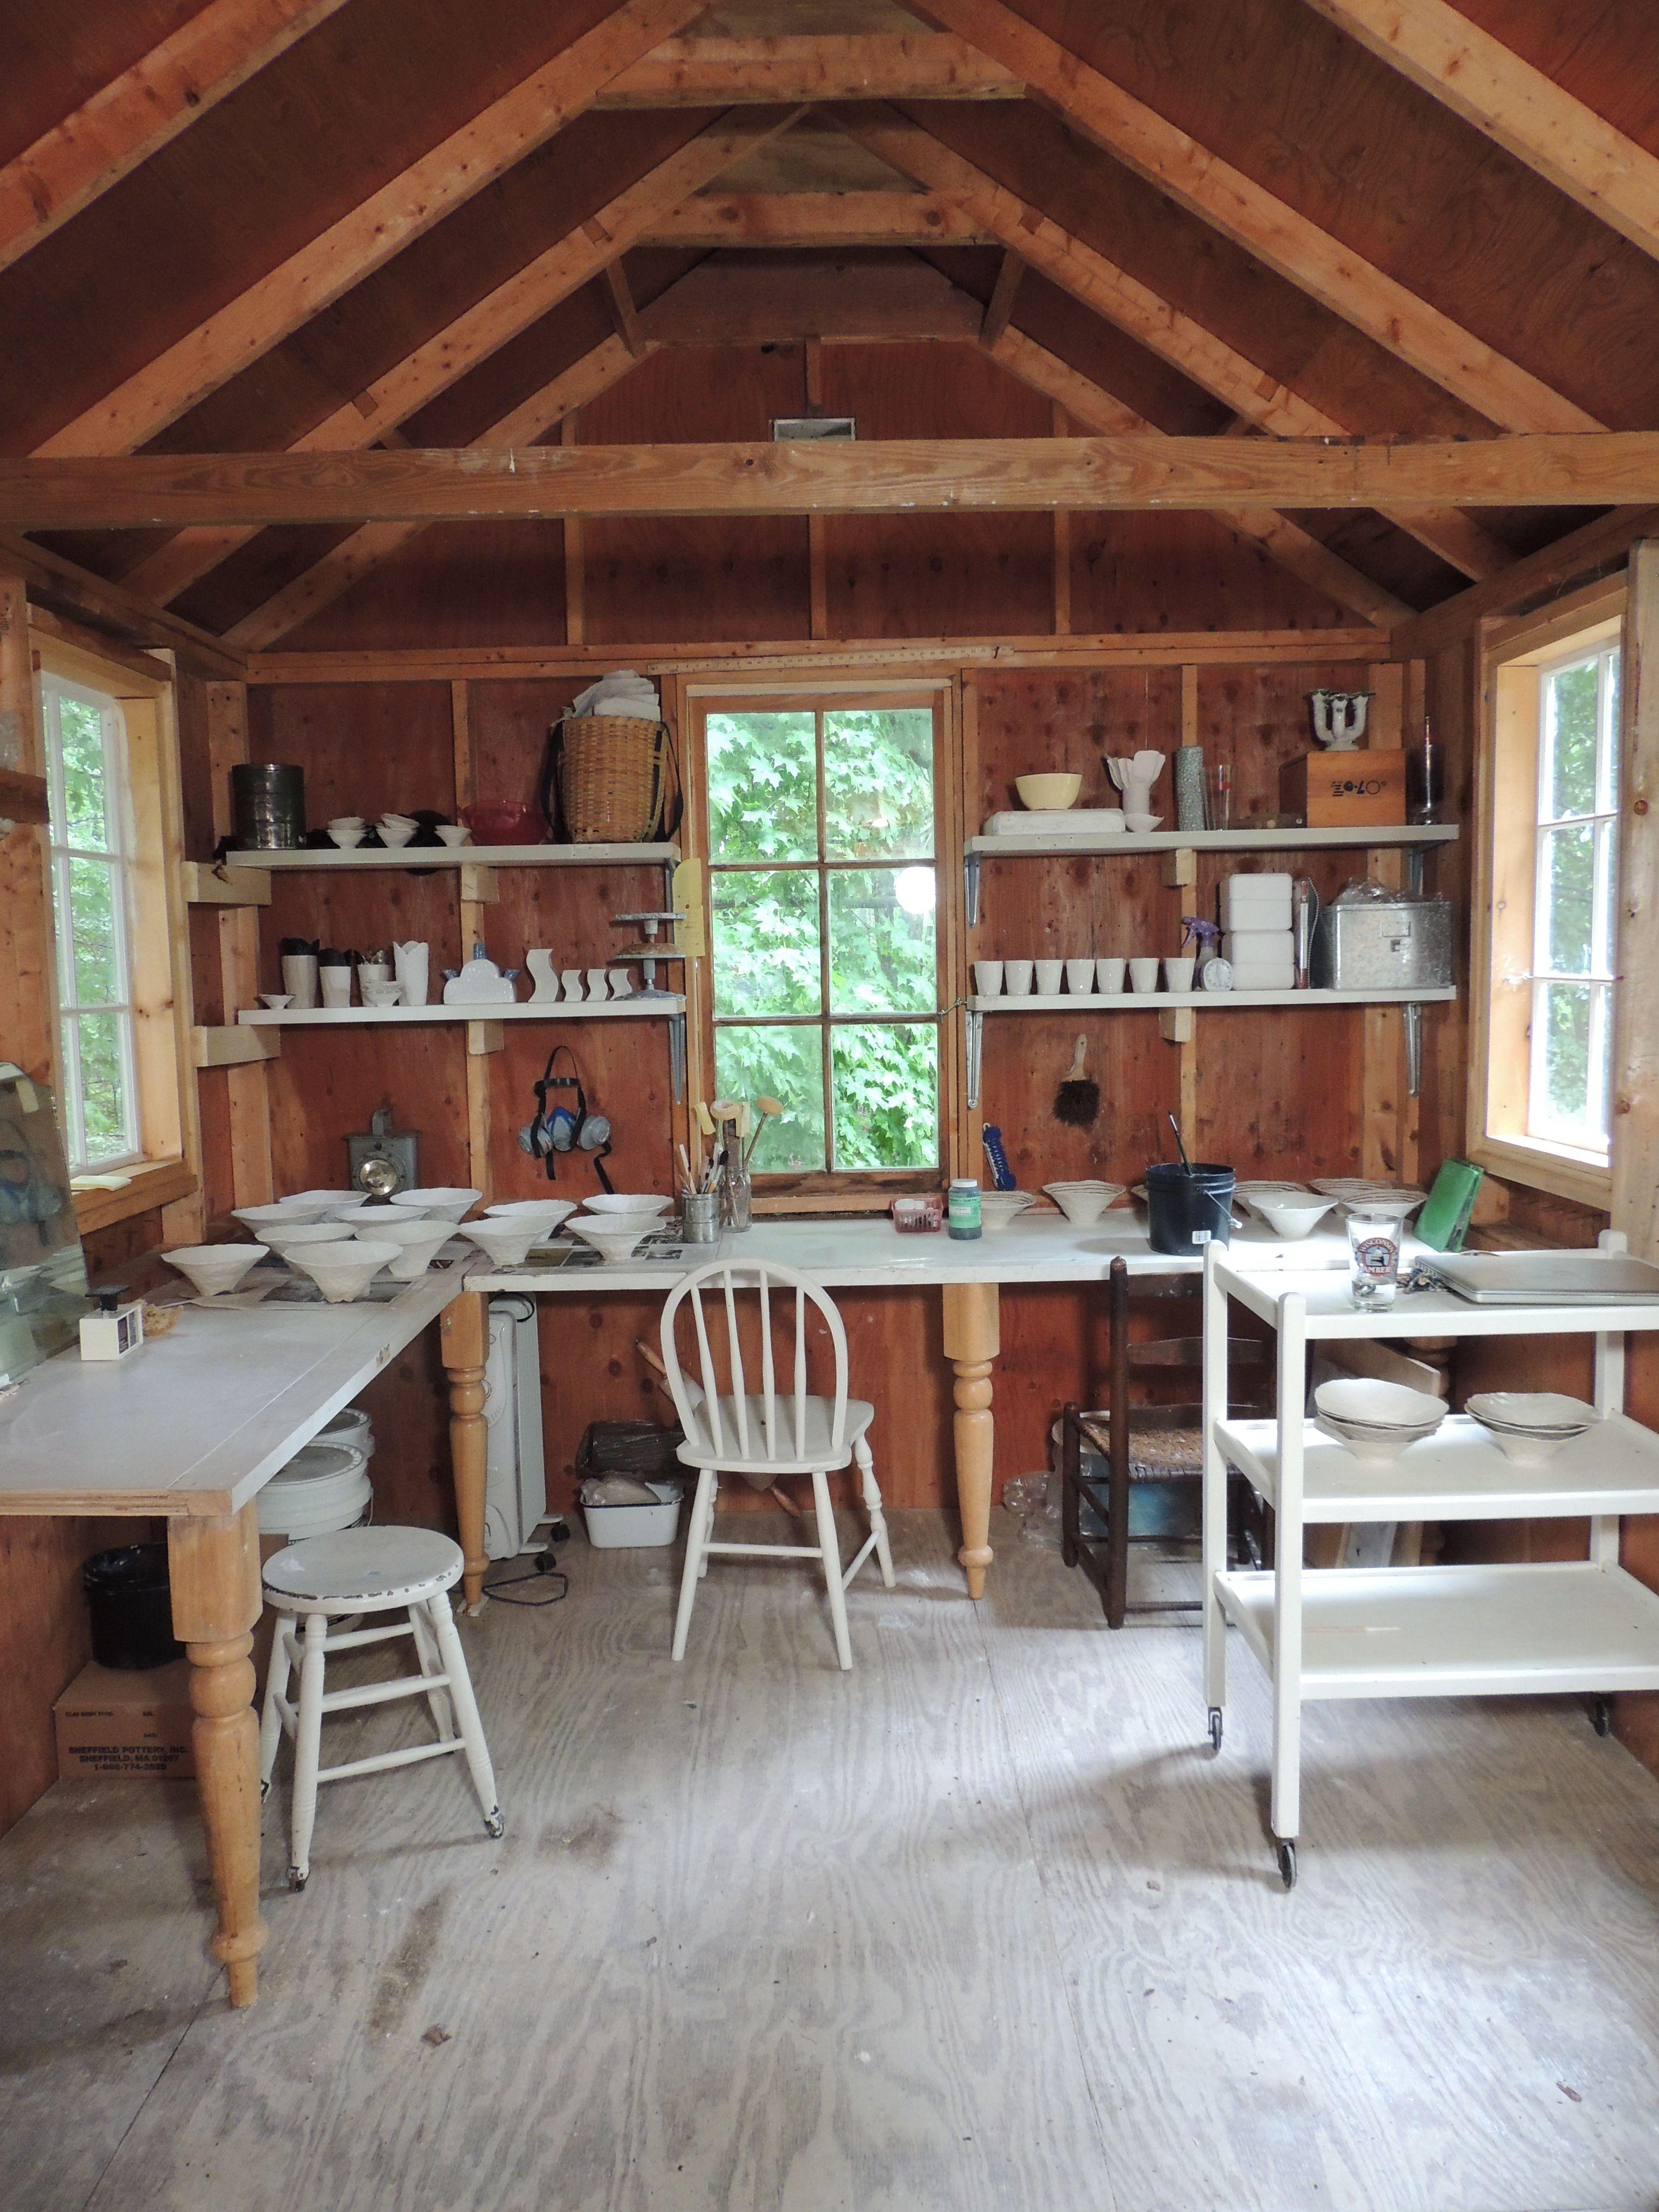 In 2011 the hypertalented ceramicist isabel halley set